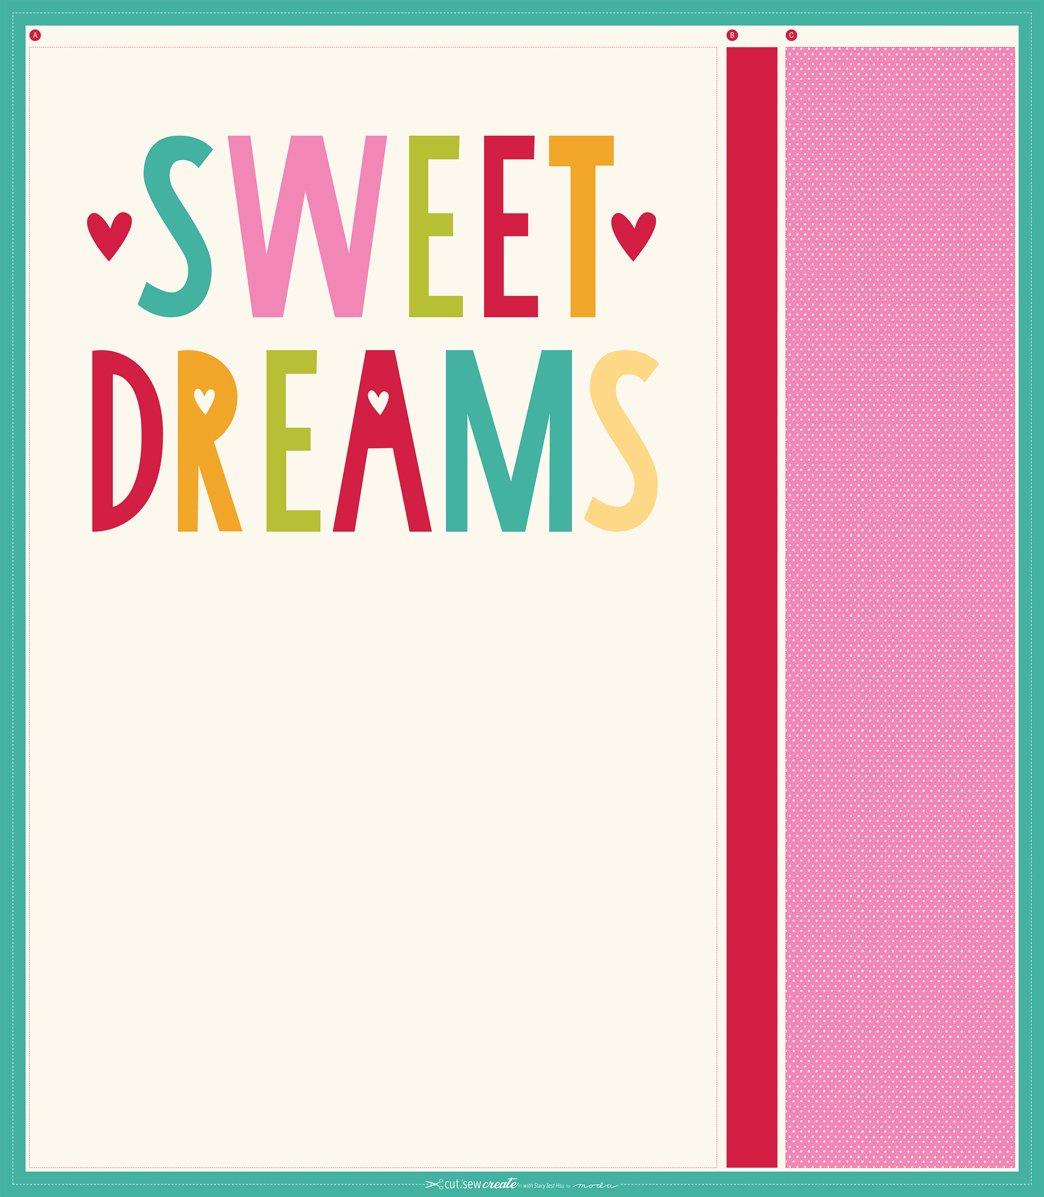 Sweet dreams Pillow Case- Stacy Iest Hsu